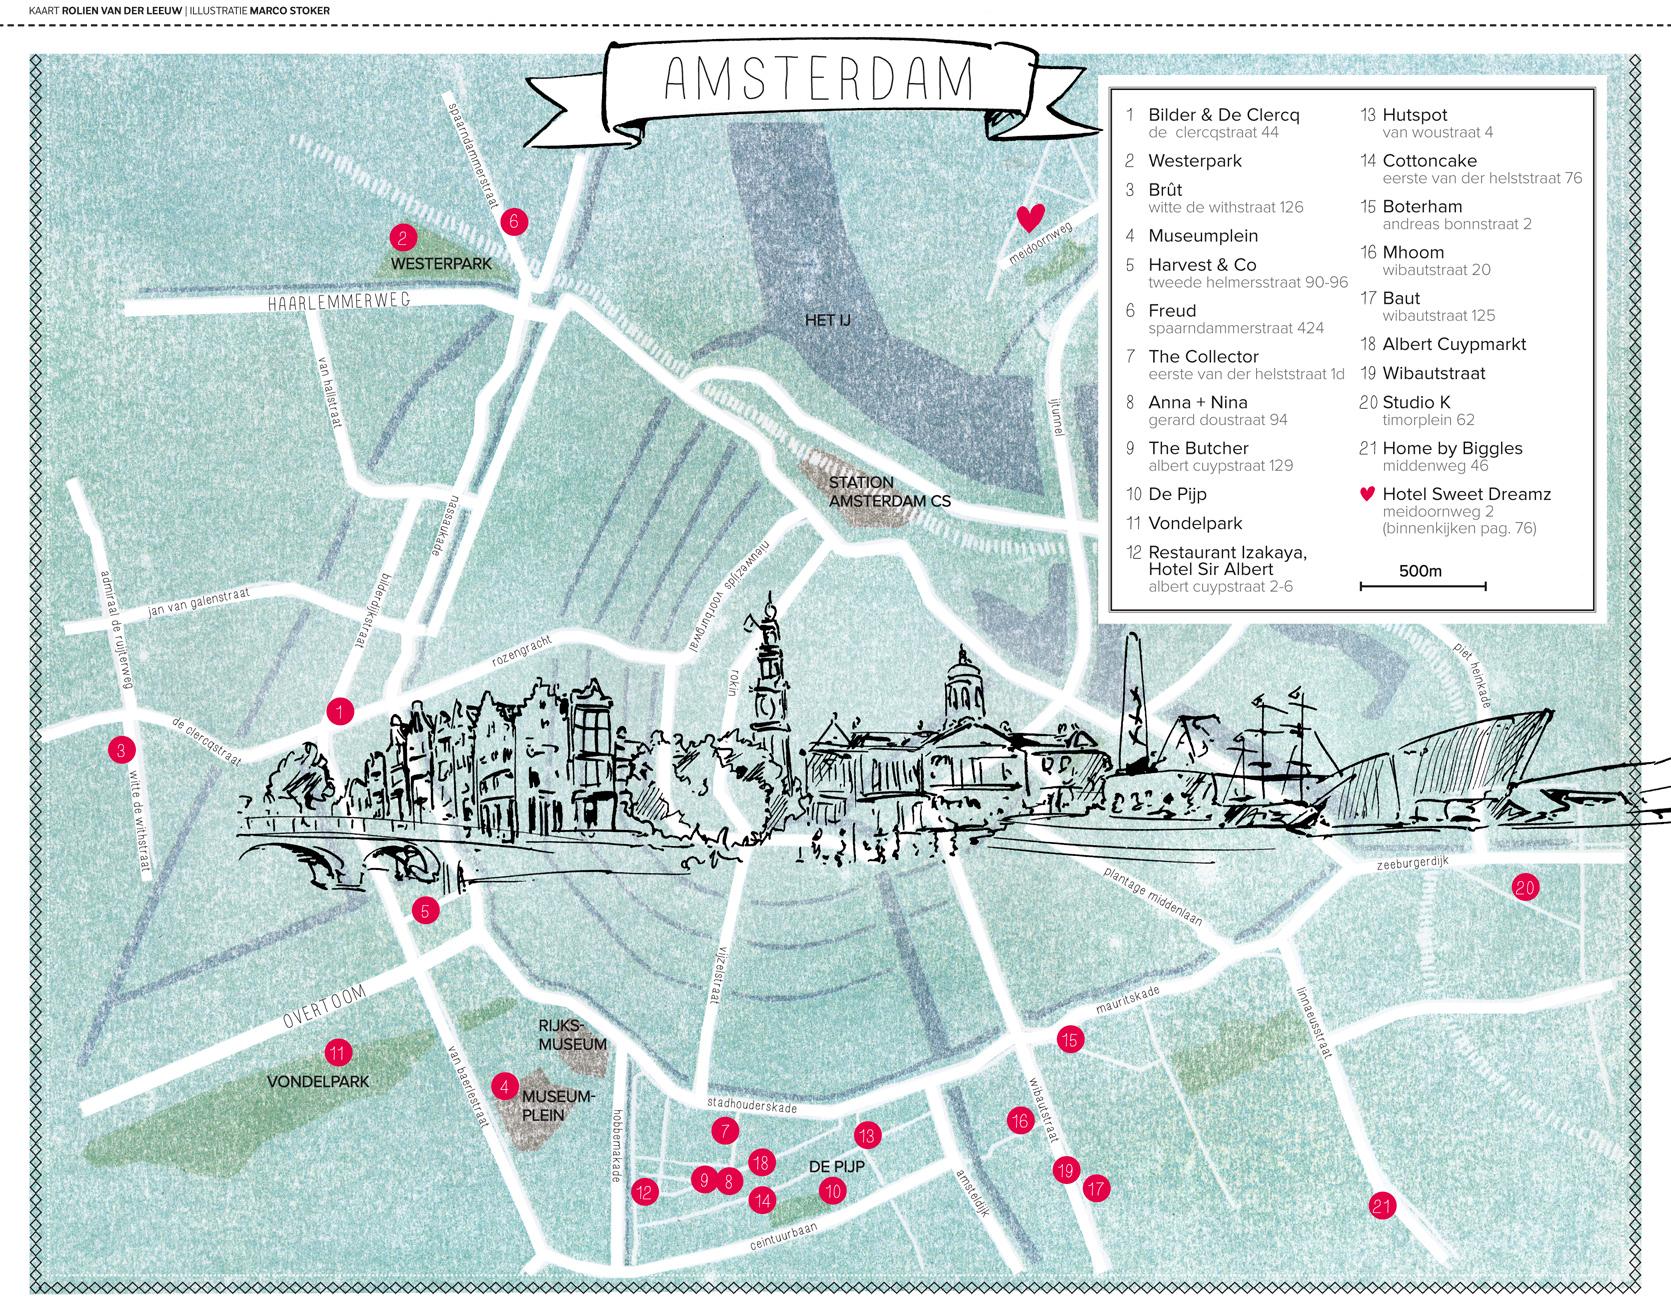 hotspots Amsterdam plattegrond